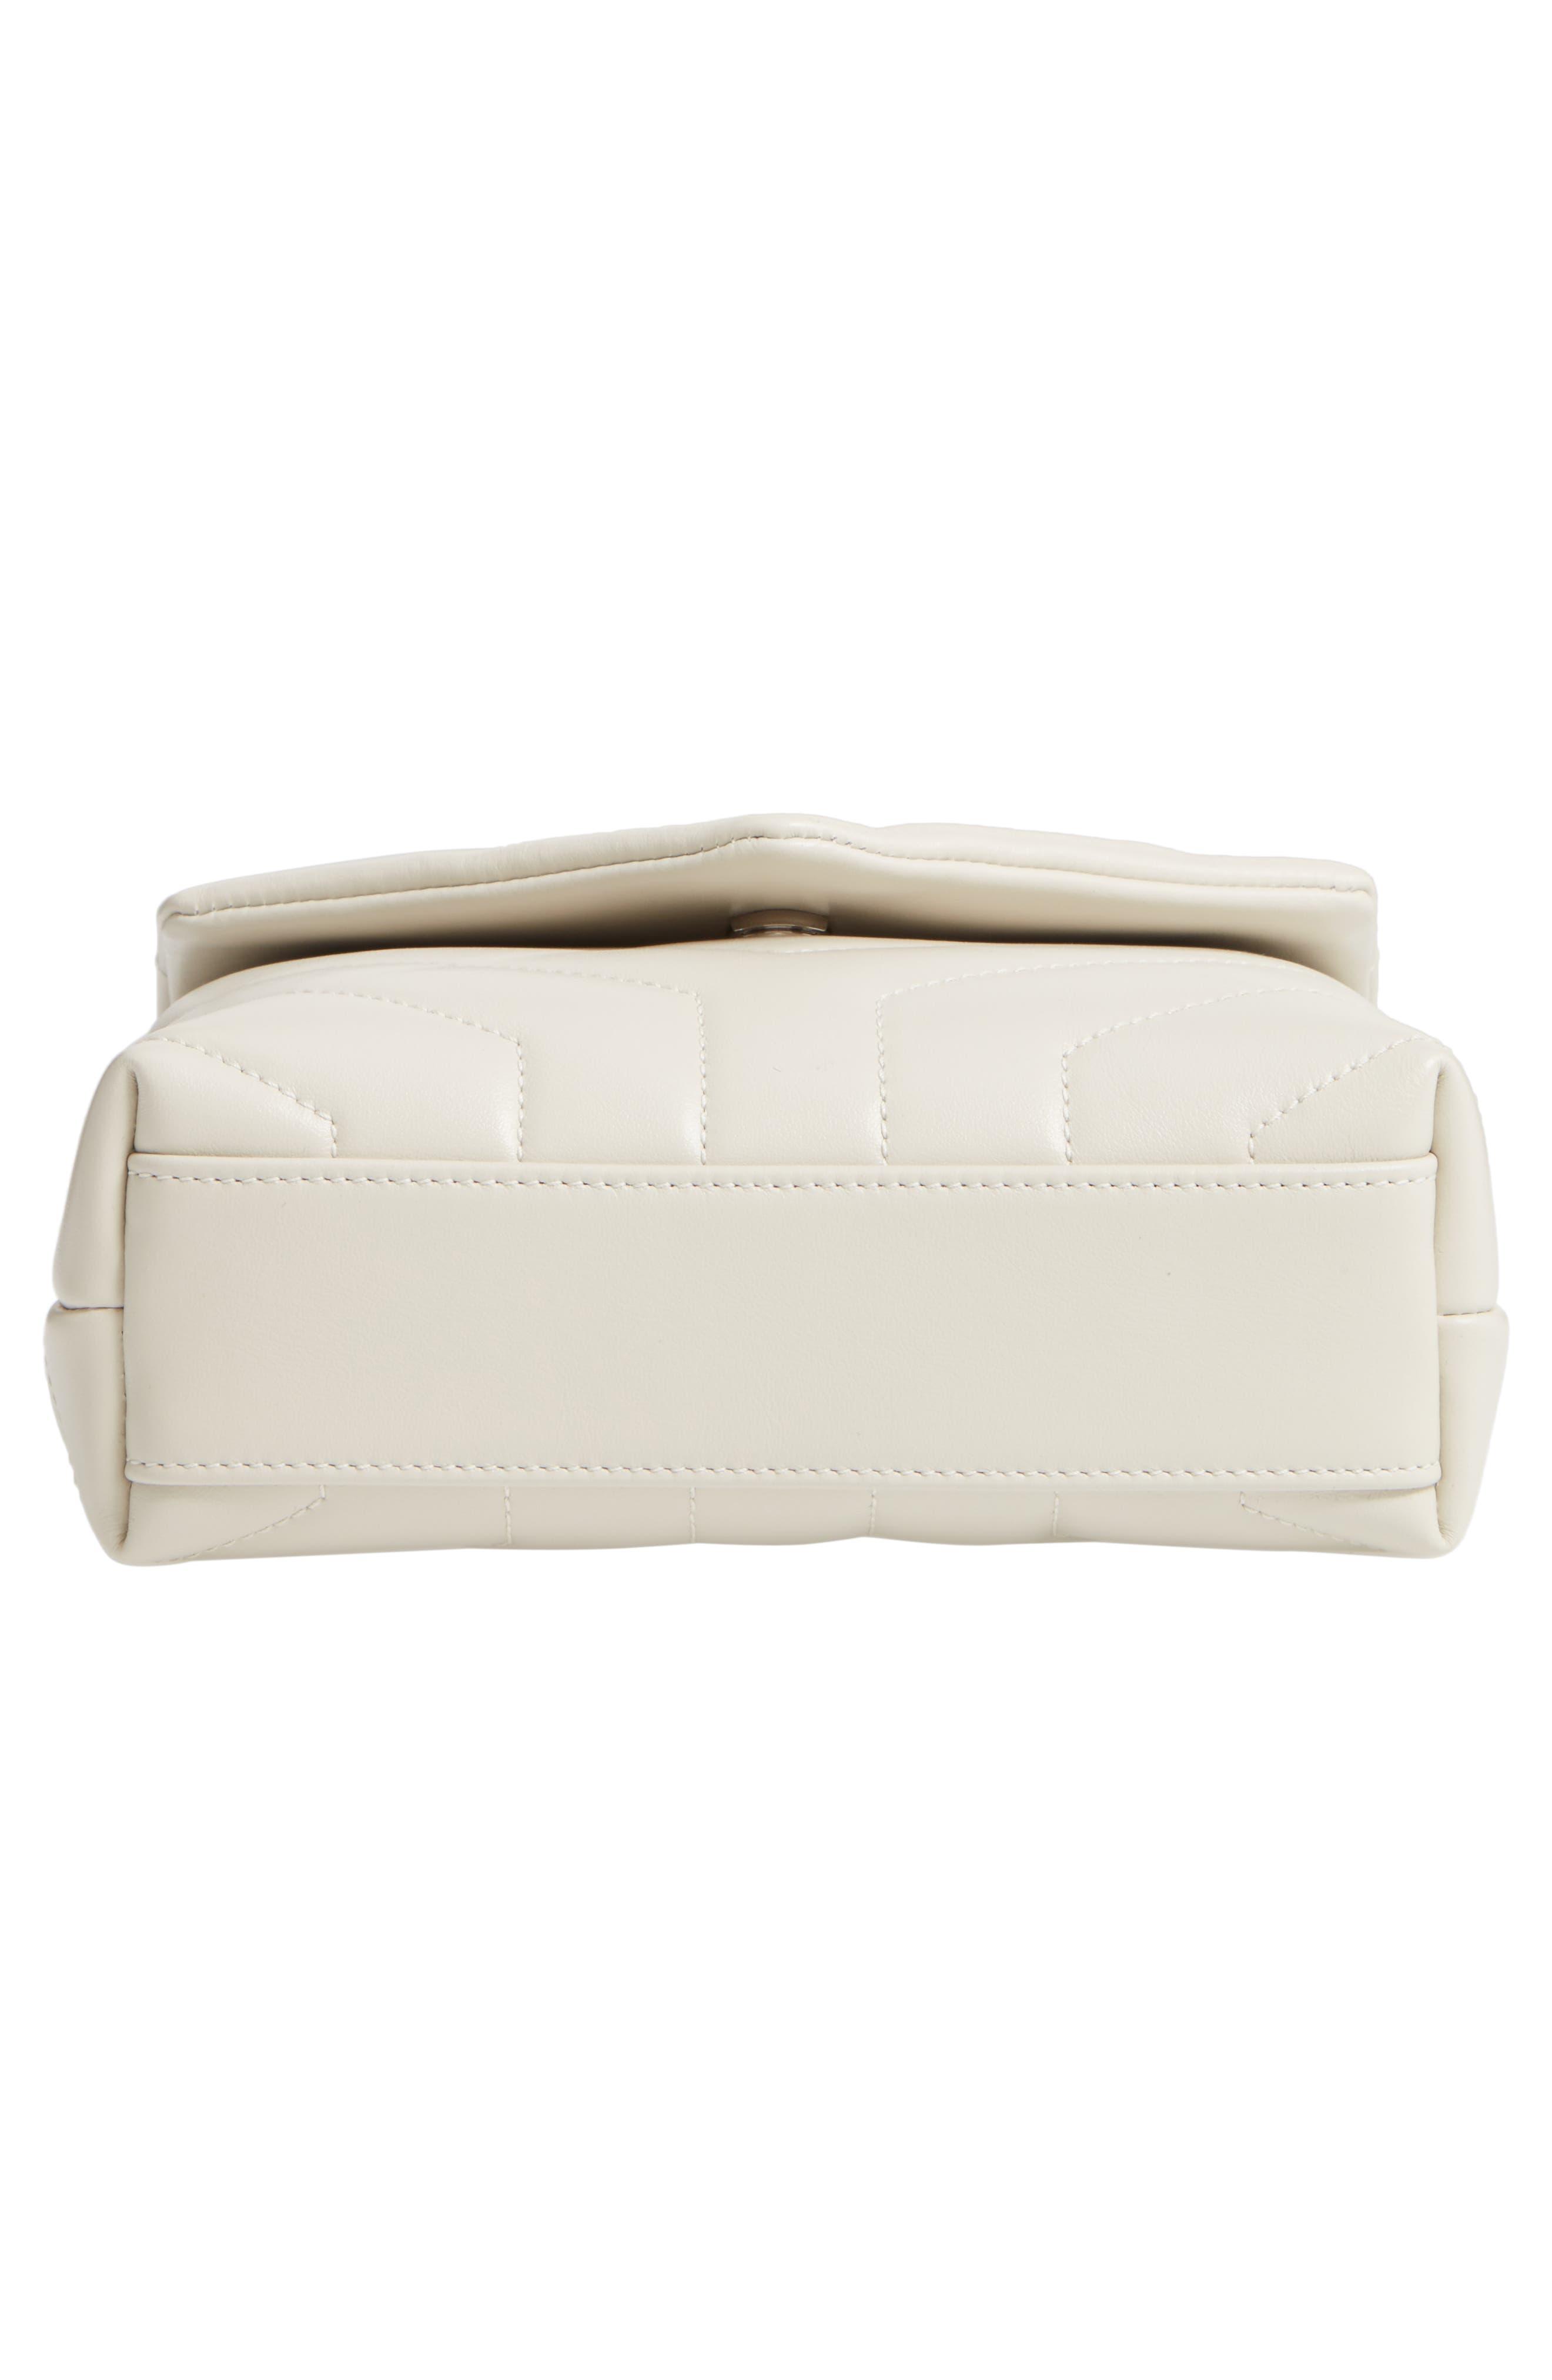 SAINT LAURENT, Toy Loulou Calfskin Leather Crossbody Bag, Alternate thumbnail 6, color, CREMA SOFT